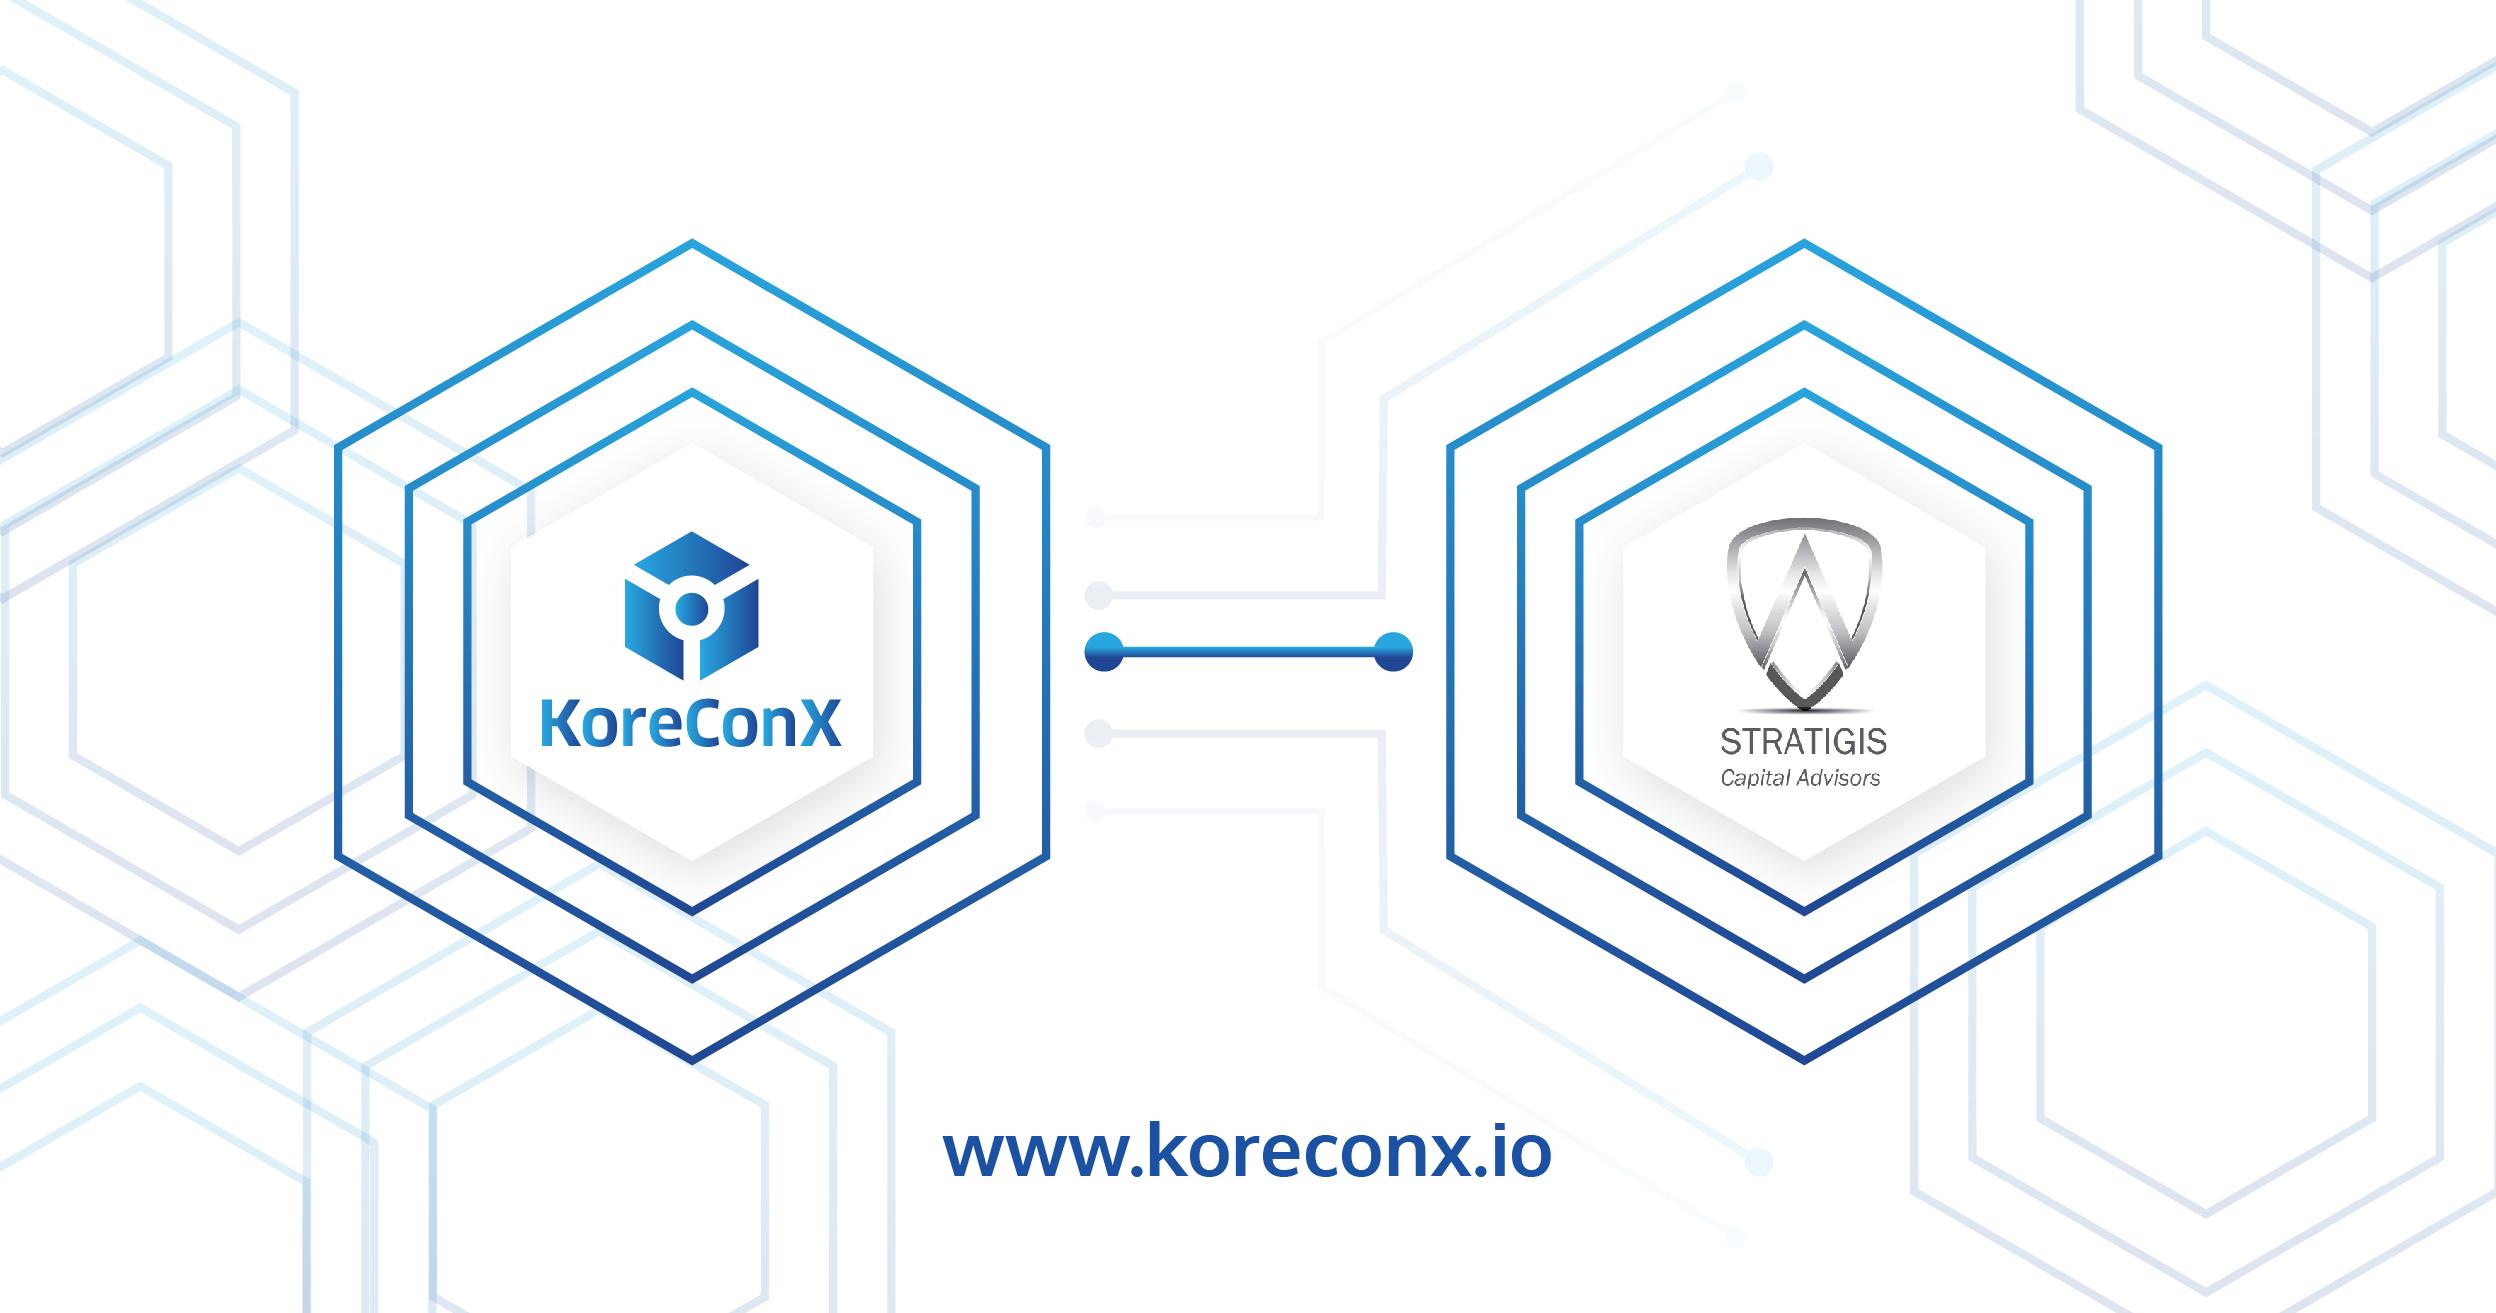 KoreConX STRATIGIS